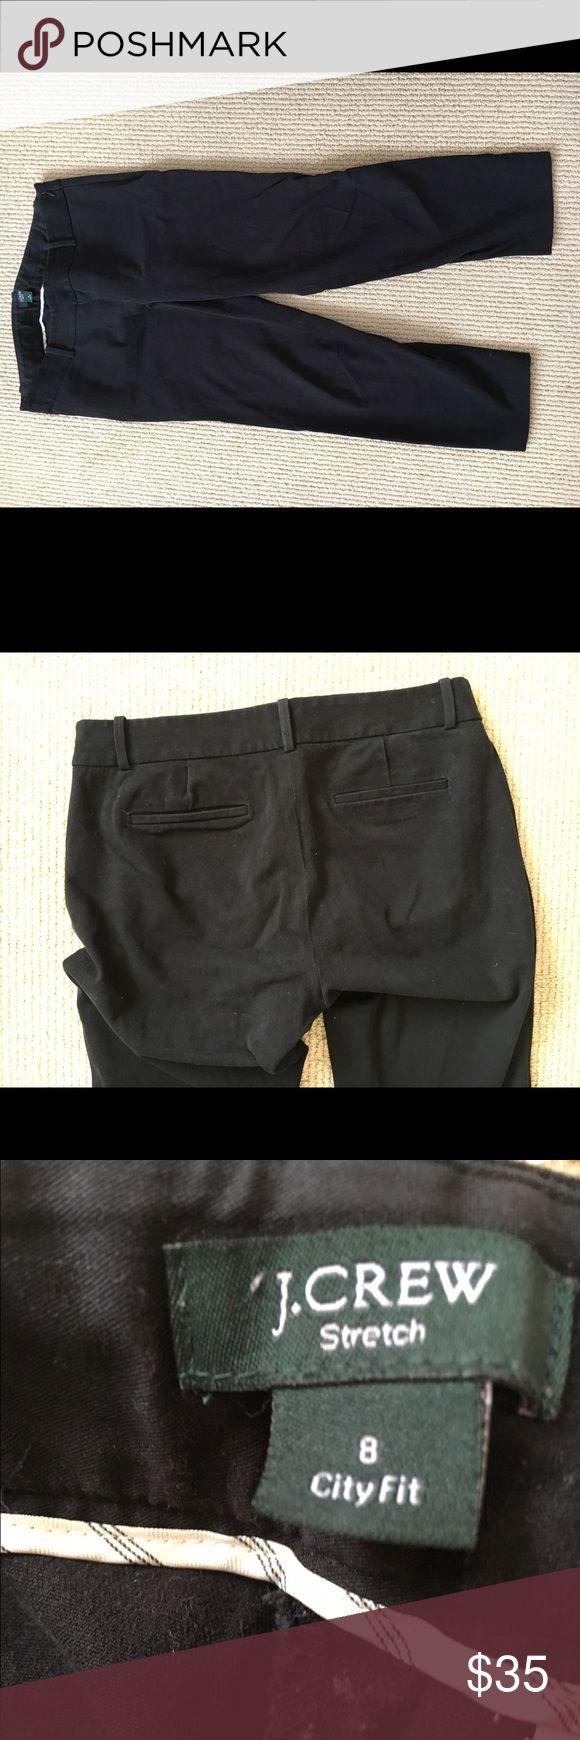 "Rare J. Crew Minnie cropped pant Size 8 Lightly worn black J. Crew Minnie pant. Ultra flattering stretch black pant, midrise. Light fading from wash/wear. Size 8, ""city fit."" J. Crew Pants Skinny"